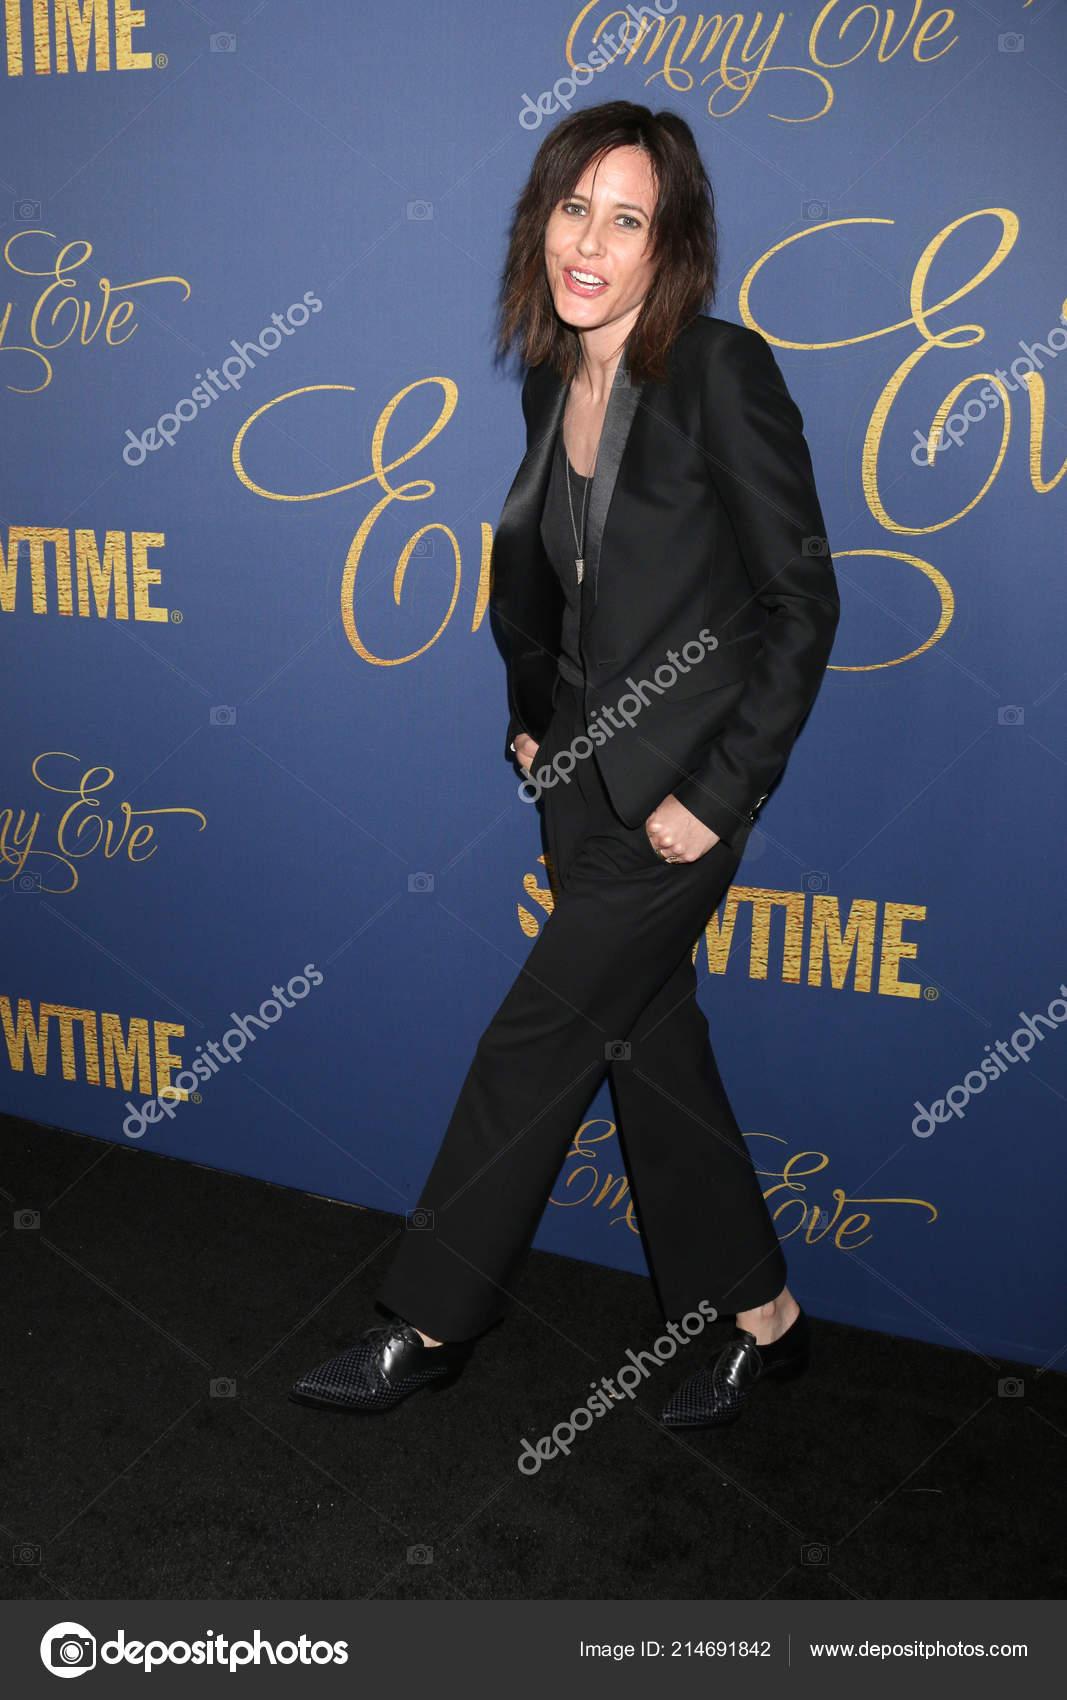 Sienna Miller (born 1981 (born in New York City,Ella Guevara (b. 1998) Sex gallery Jean Peters,Lily Cole